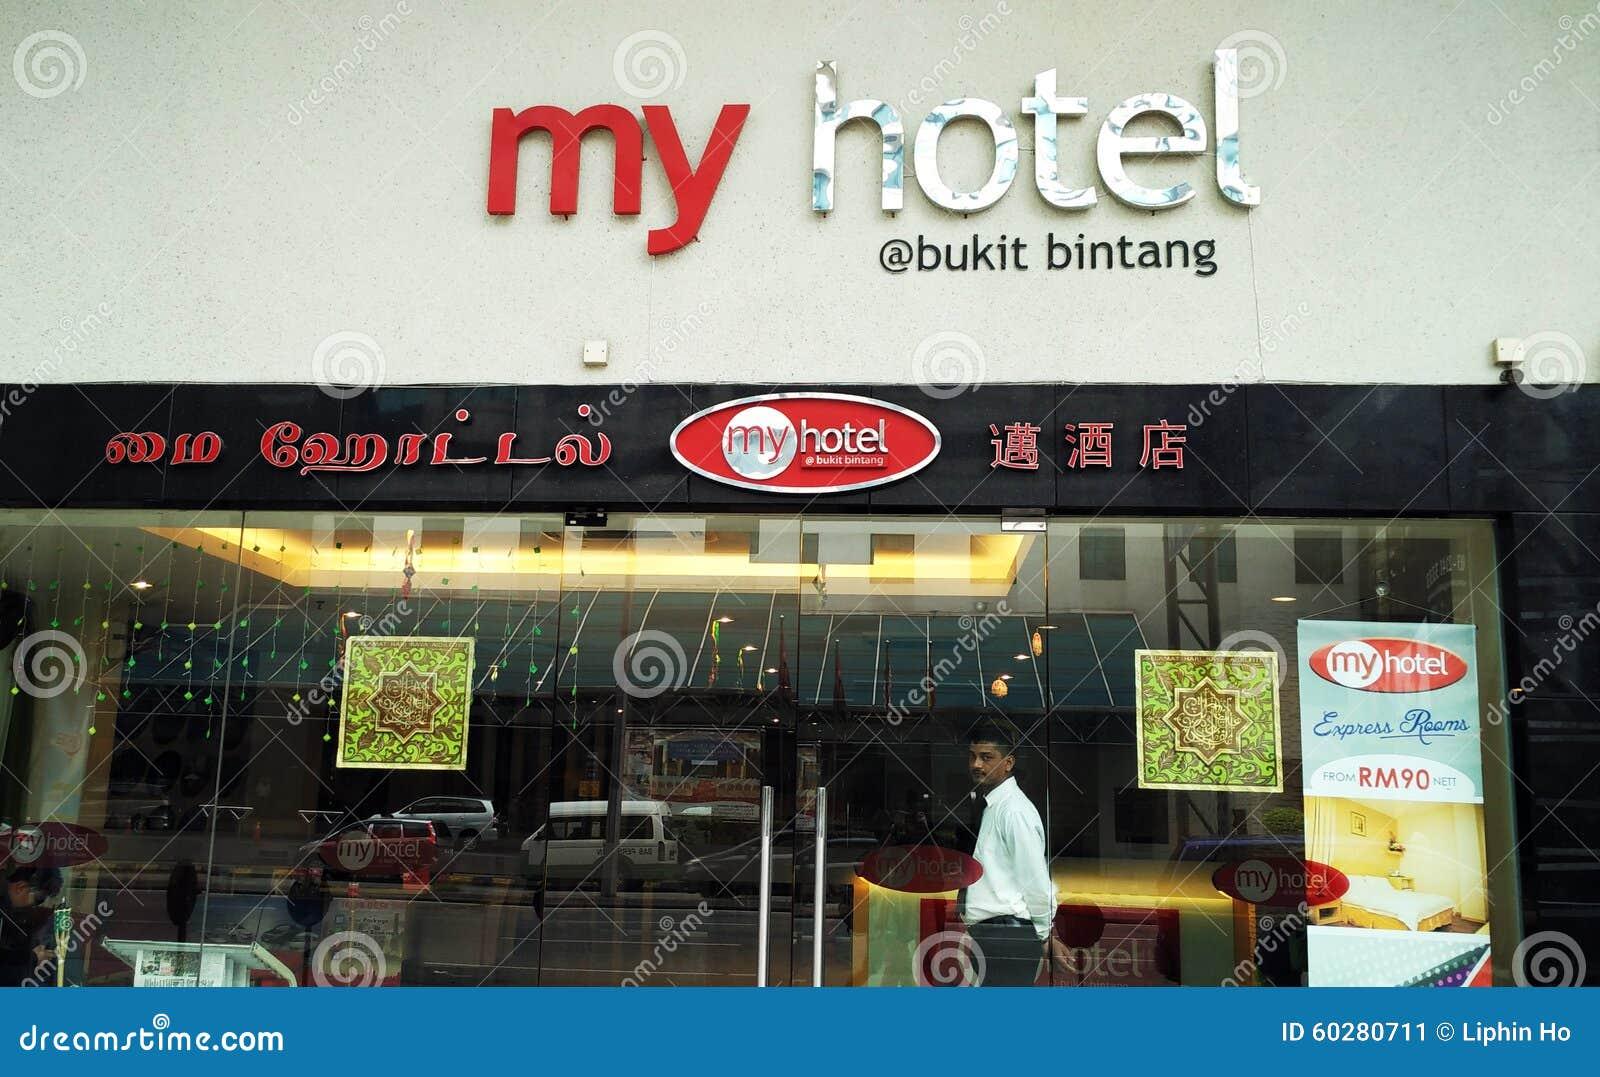 My Hotel In Bukit Bintang Kuala Lumpur